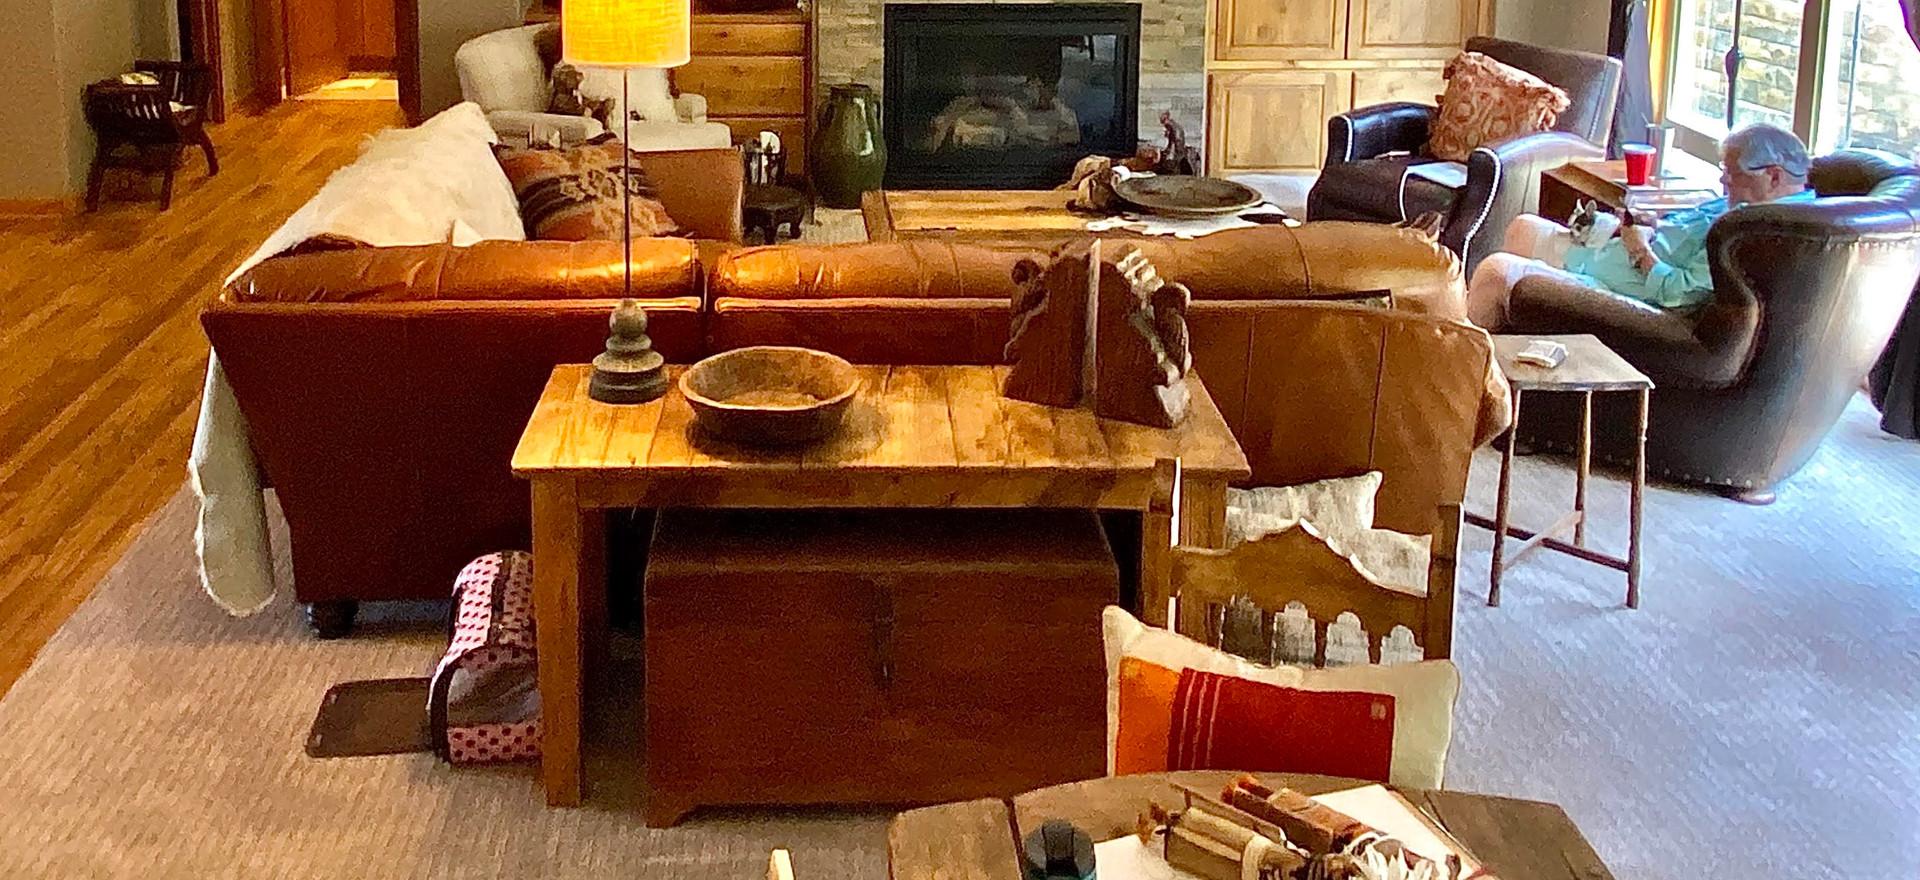 Interior Styling - Loveland/Mariana Butte